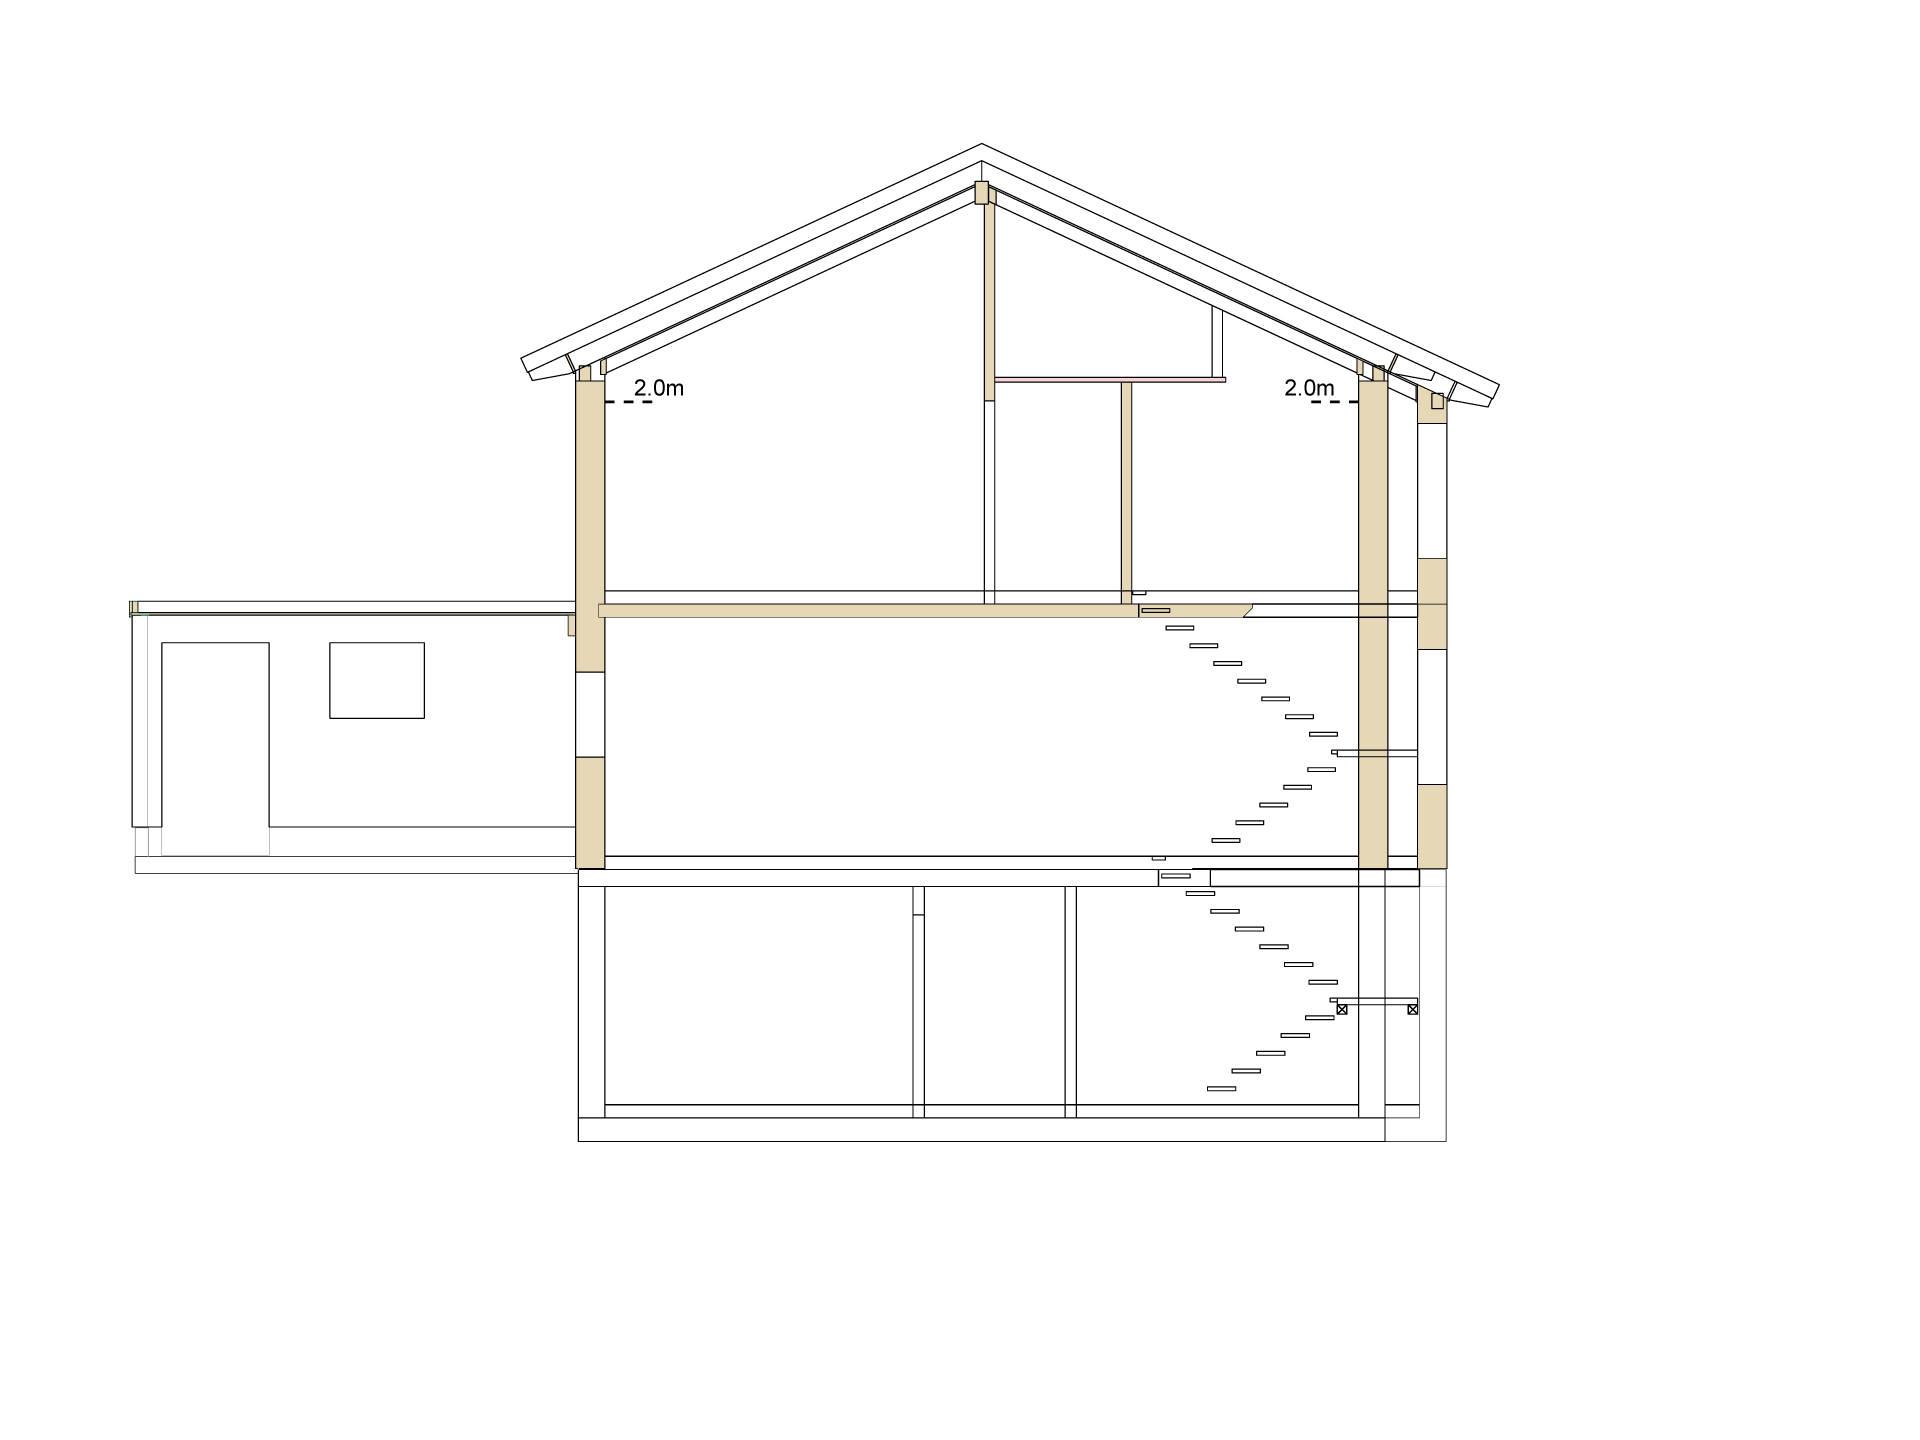 Haus Design 170 Grundriss